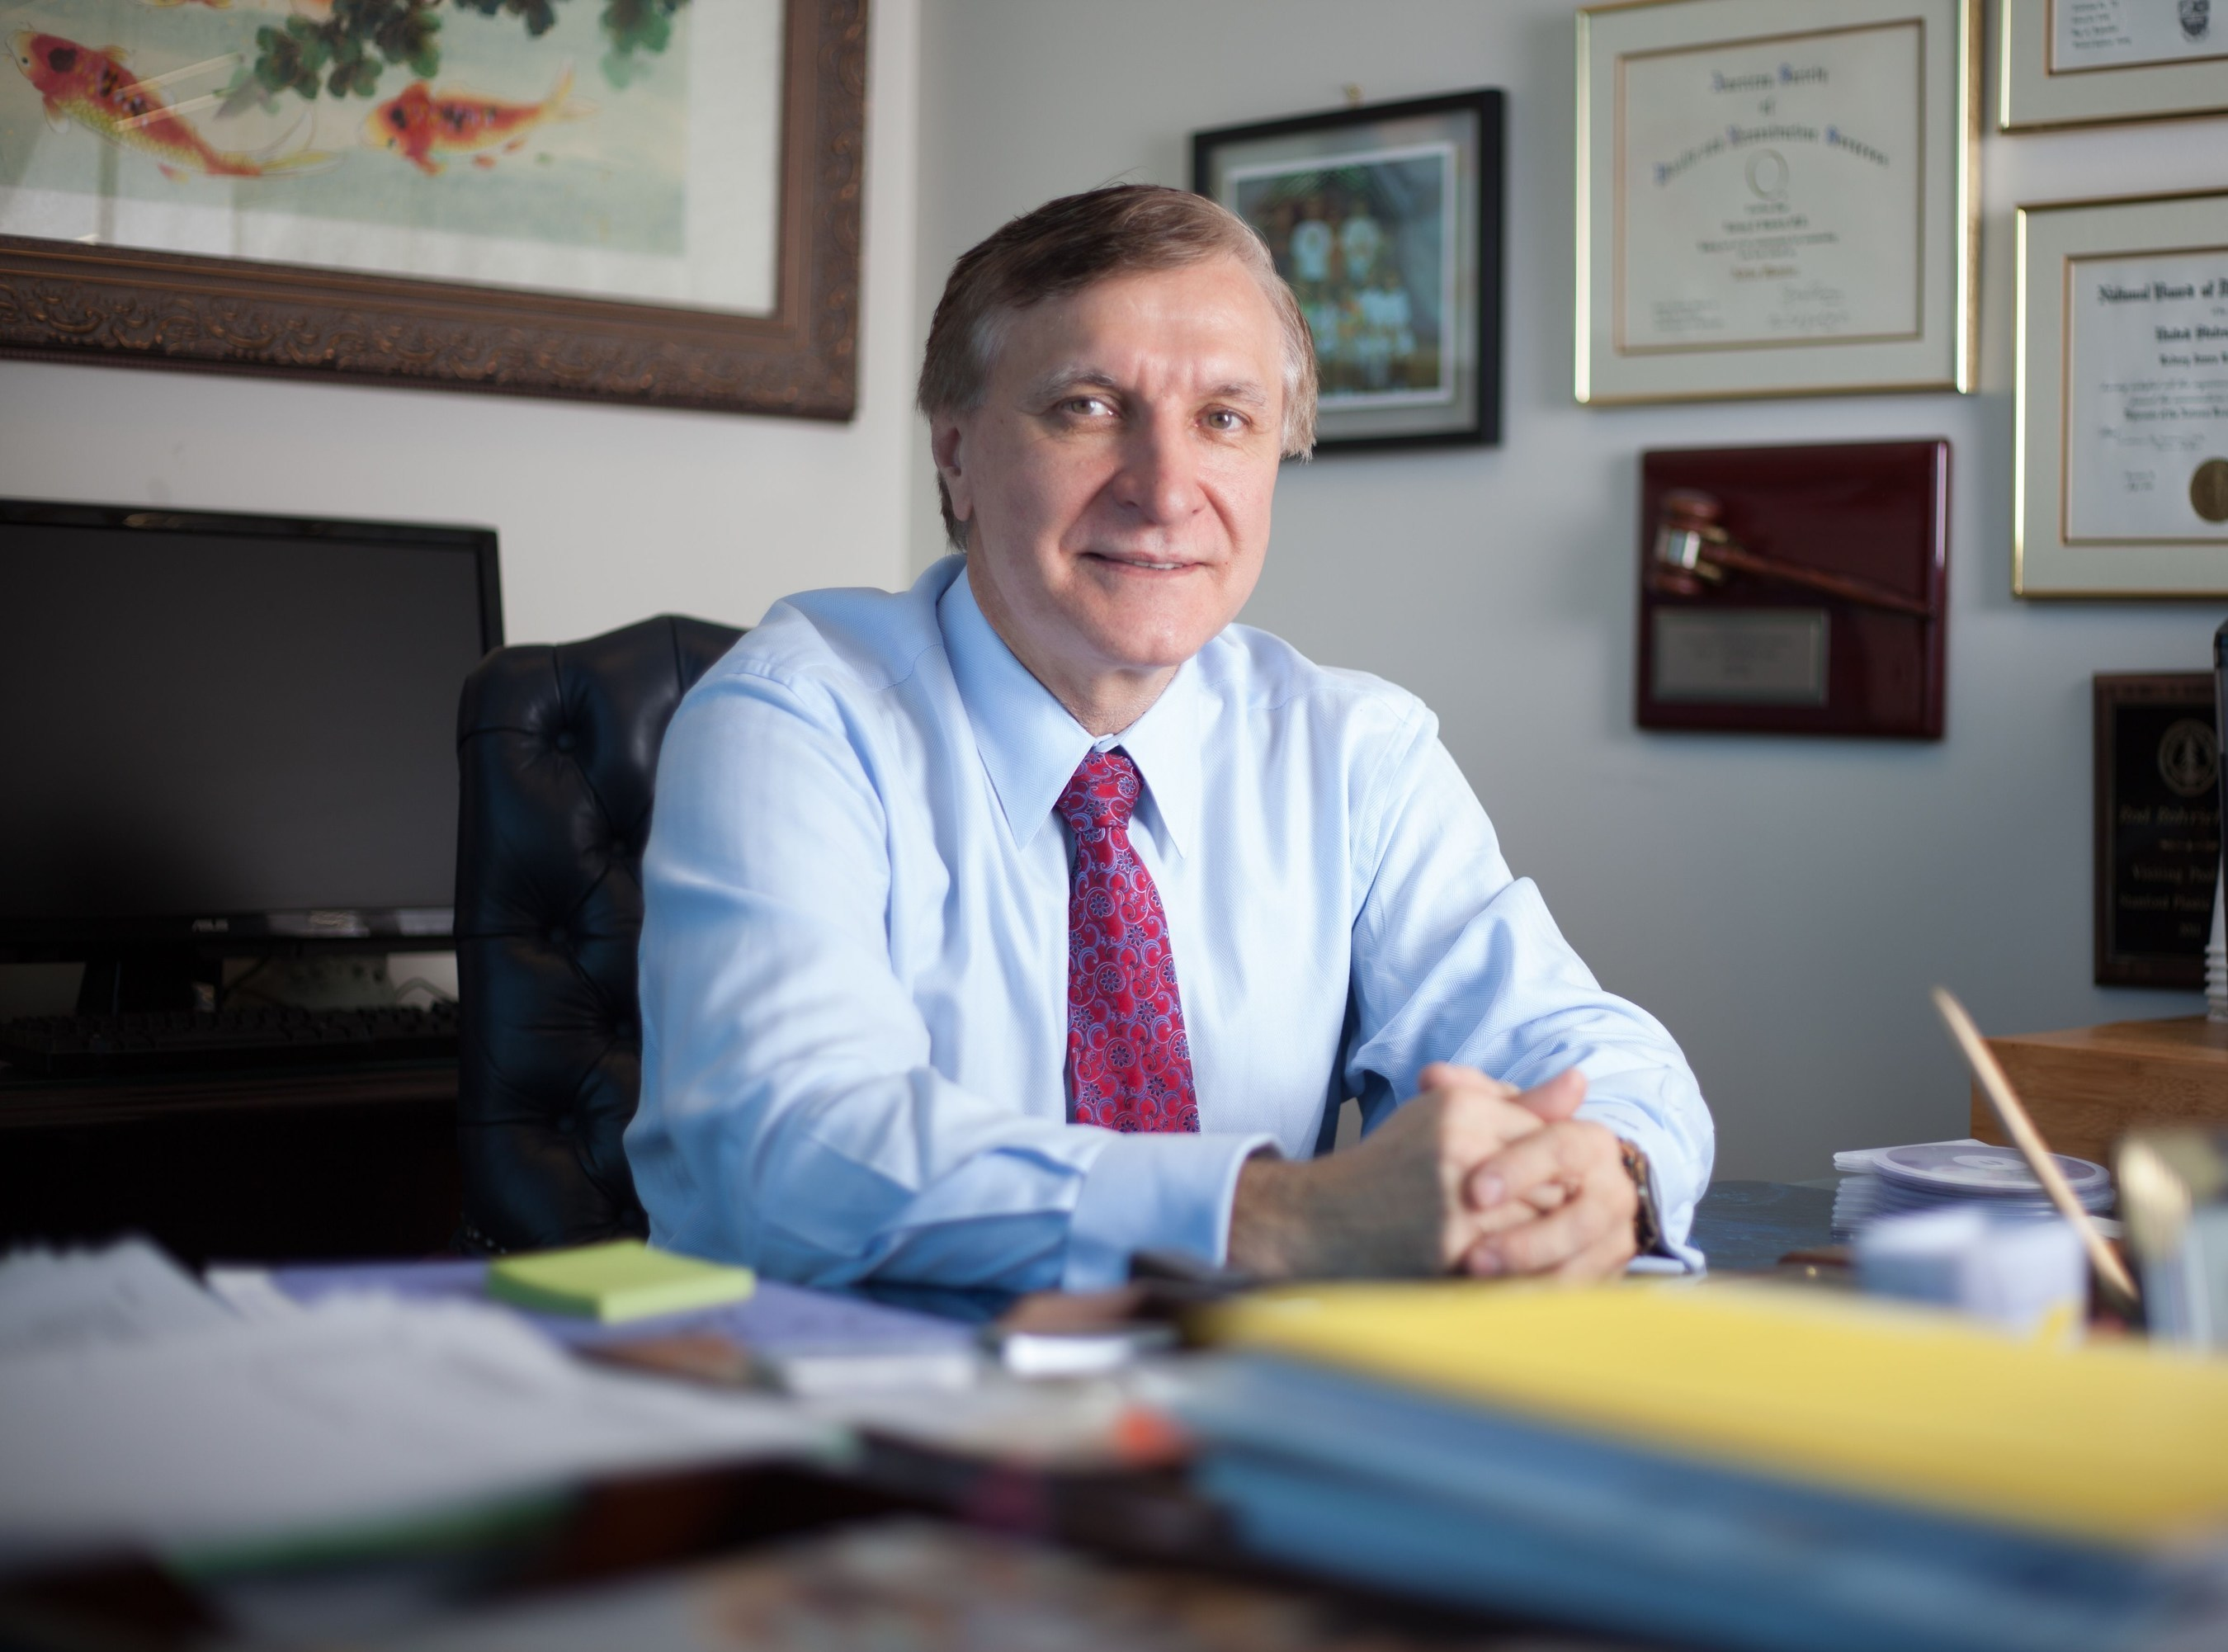 Dr. Rod Rohrich Provides Medical Expertise on Kybella